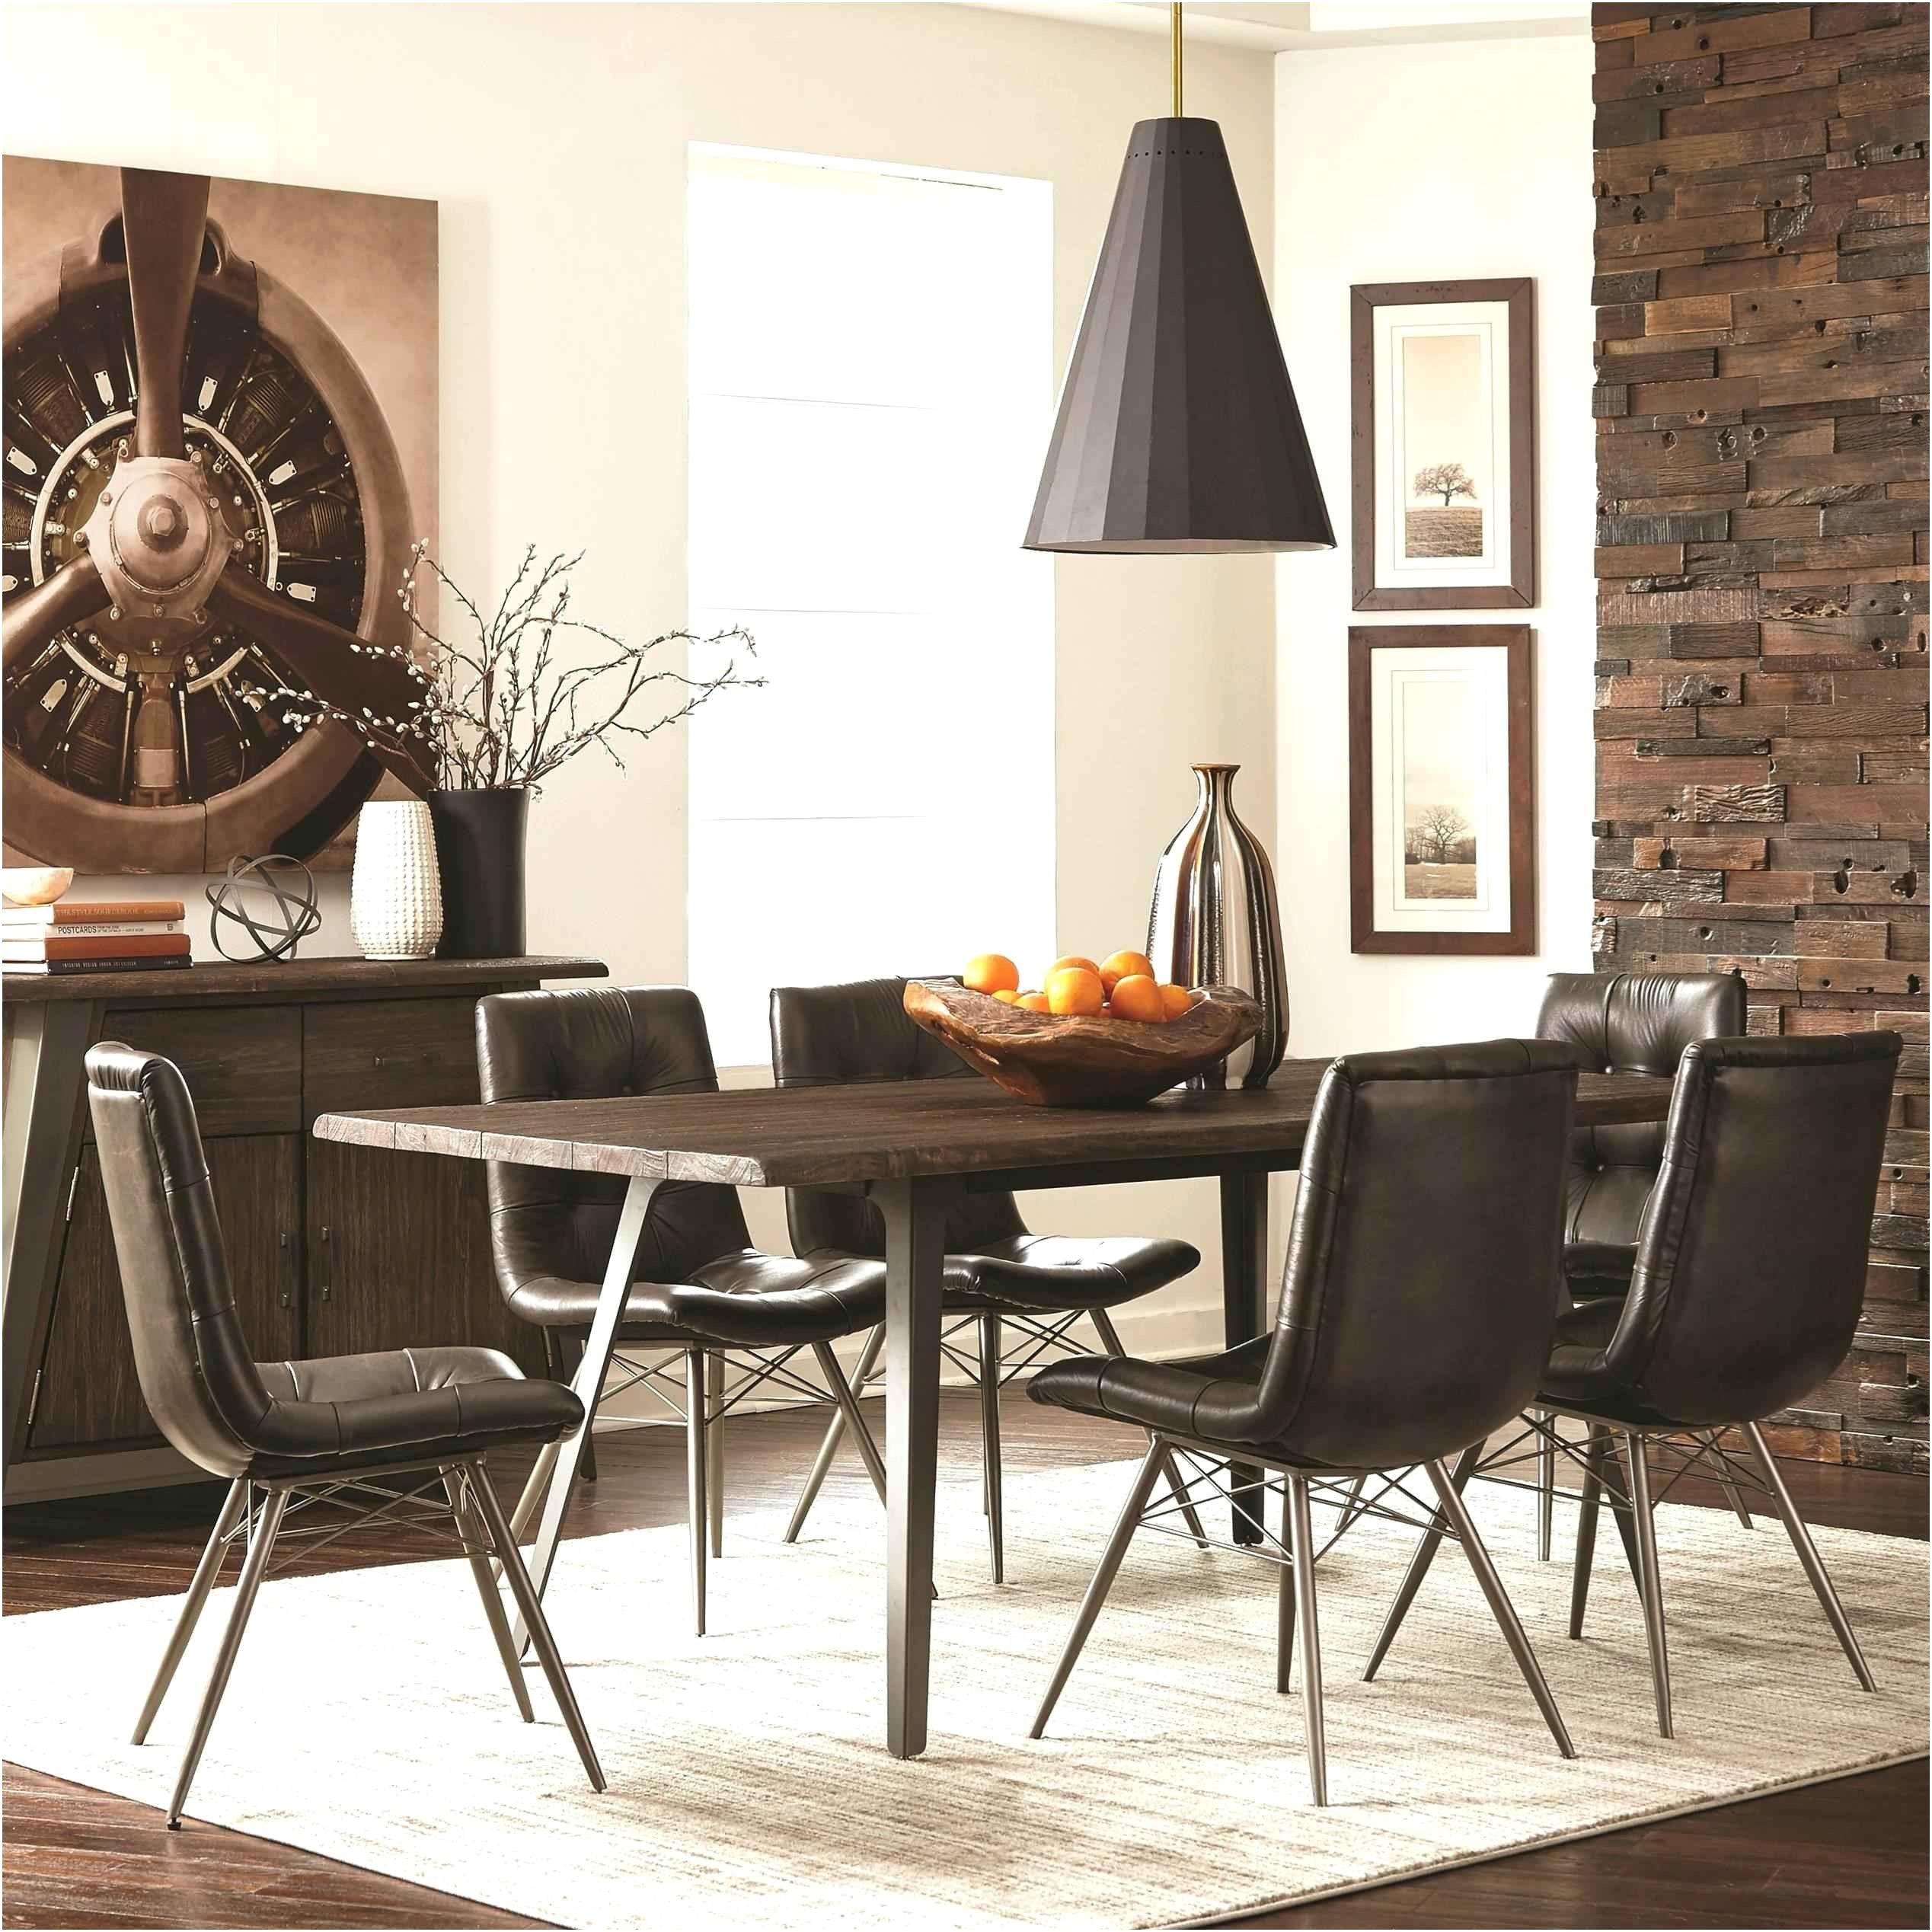 ashley furniture living room furniture ashley furniture dining room table artistic decor bright ashley